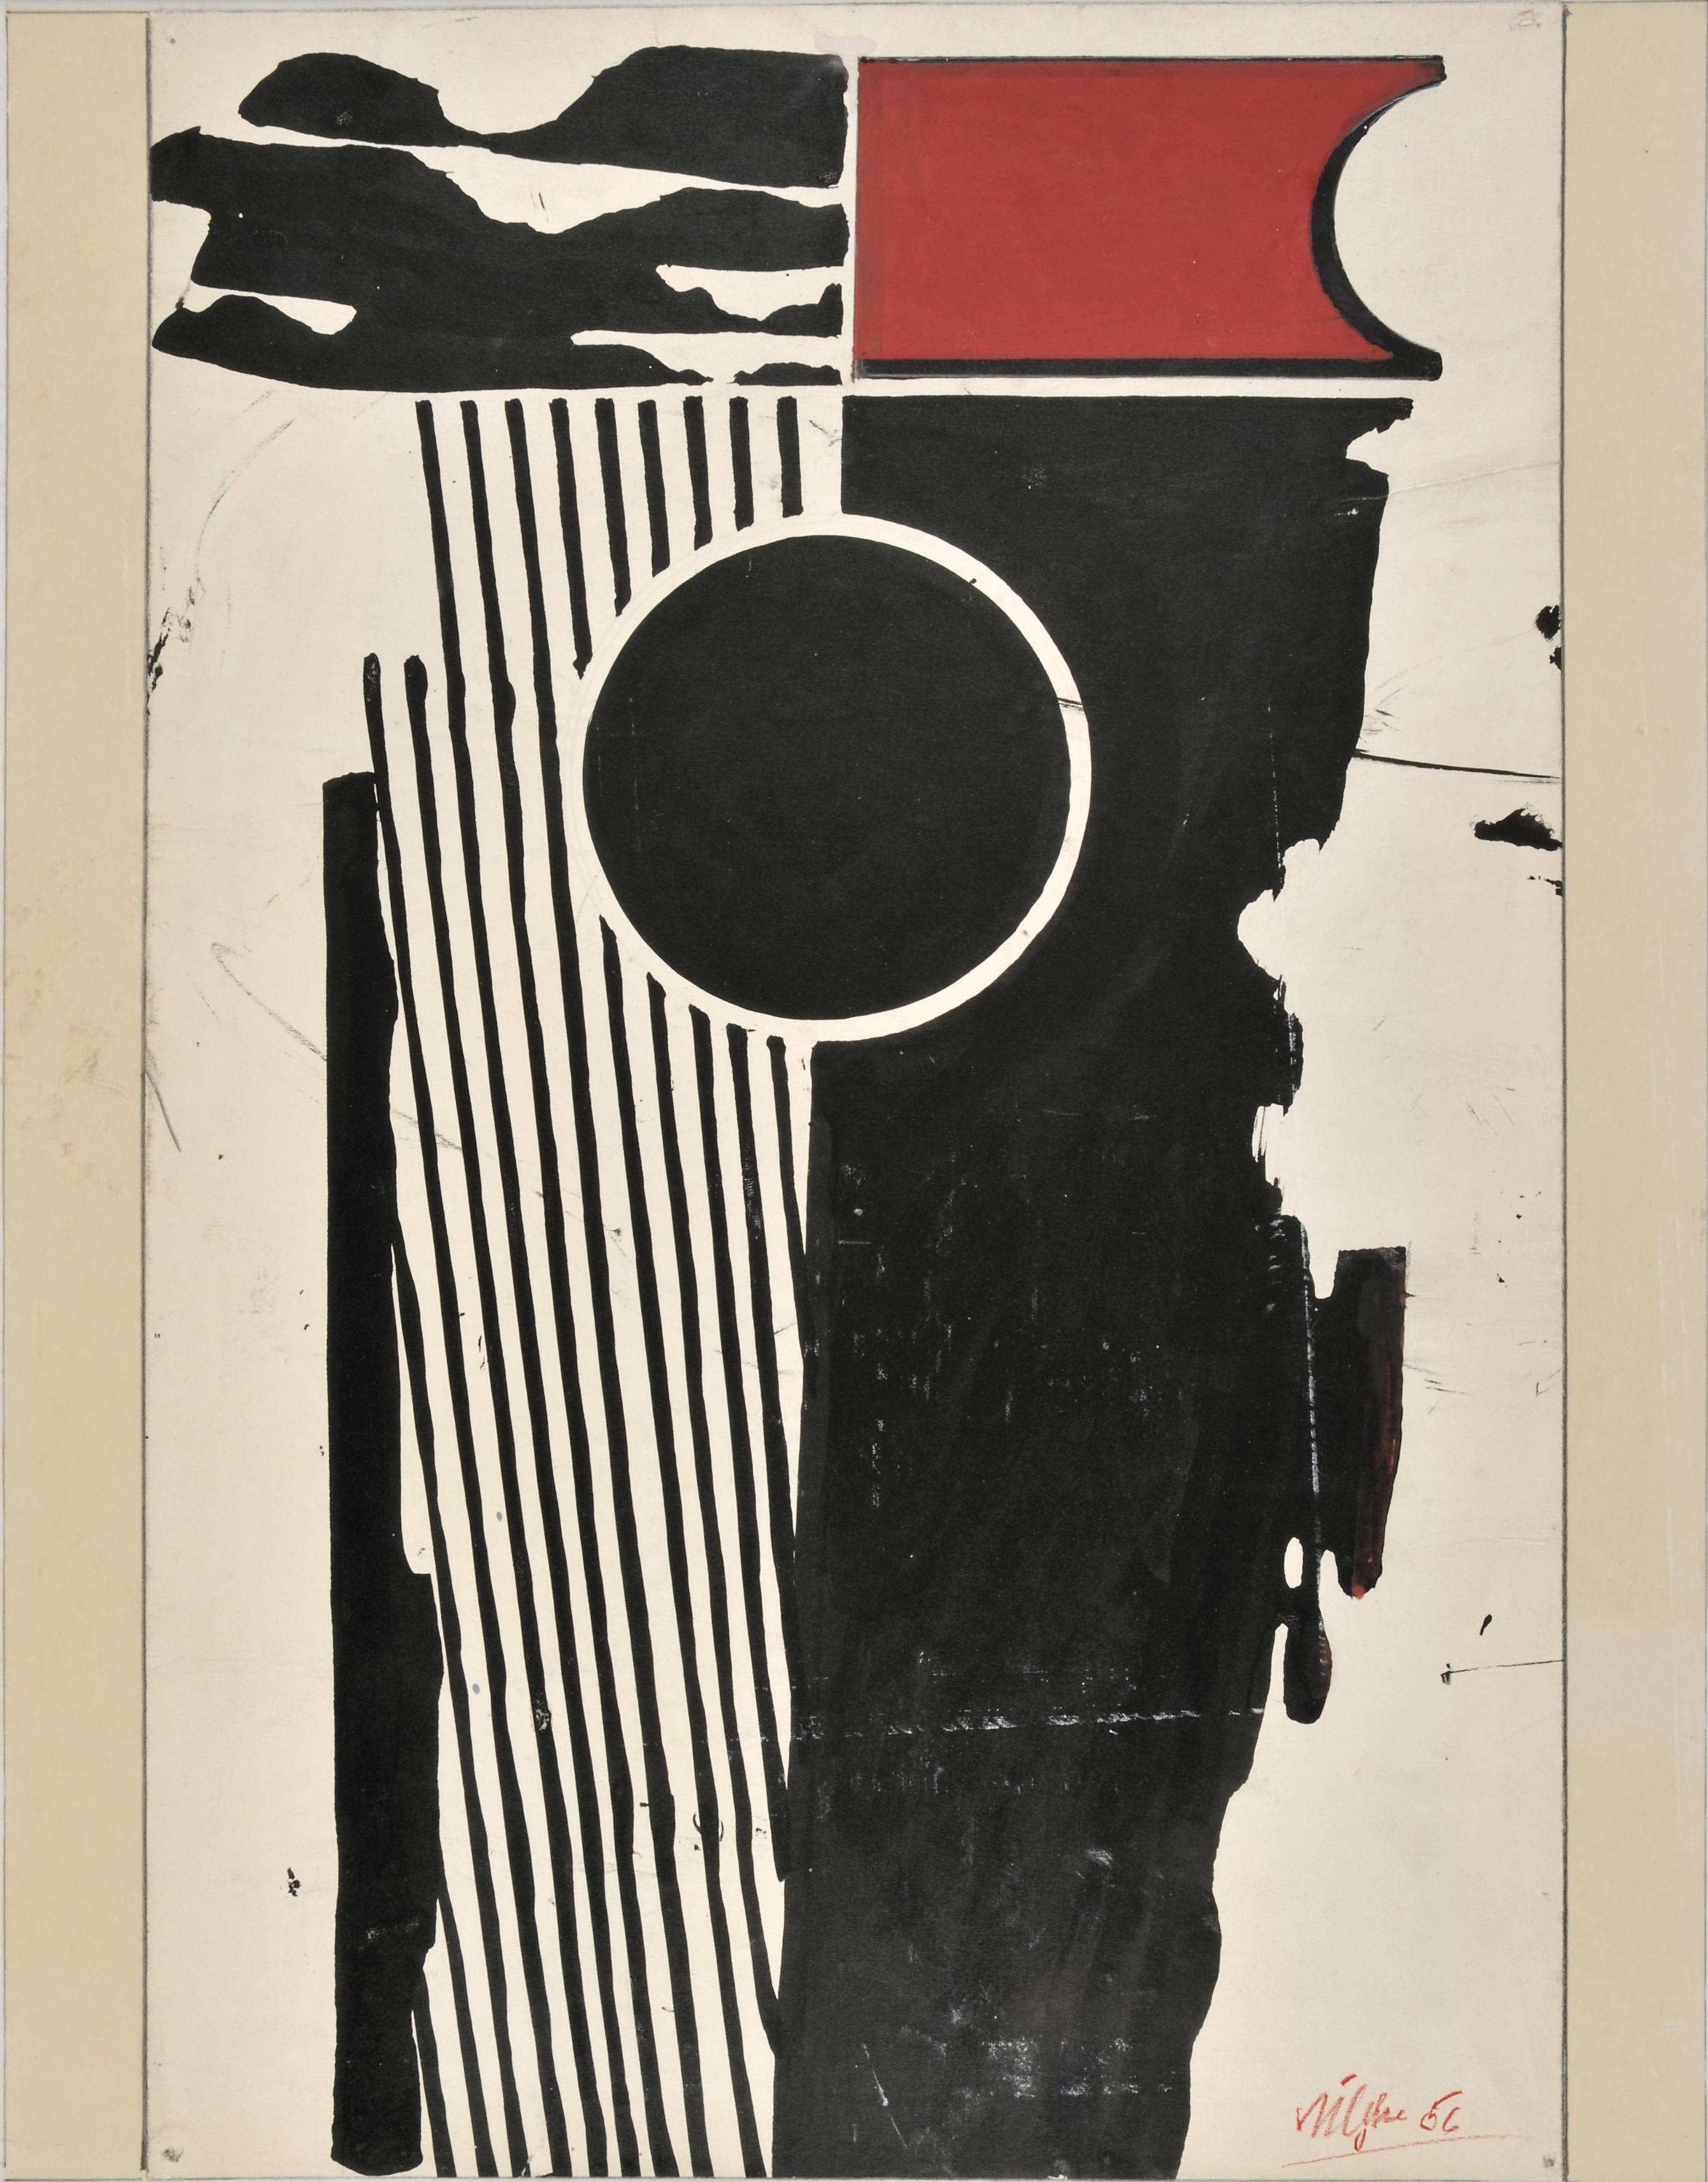 Harry Kögler: Schwarzer Block, 1956. Gouache, Graphit, Collage, 92,7 x 72,8 x 3,2 cm (Rahmenmaß). © Nachlass Harry Kögler